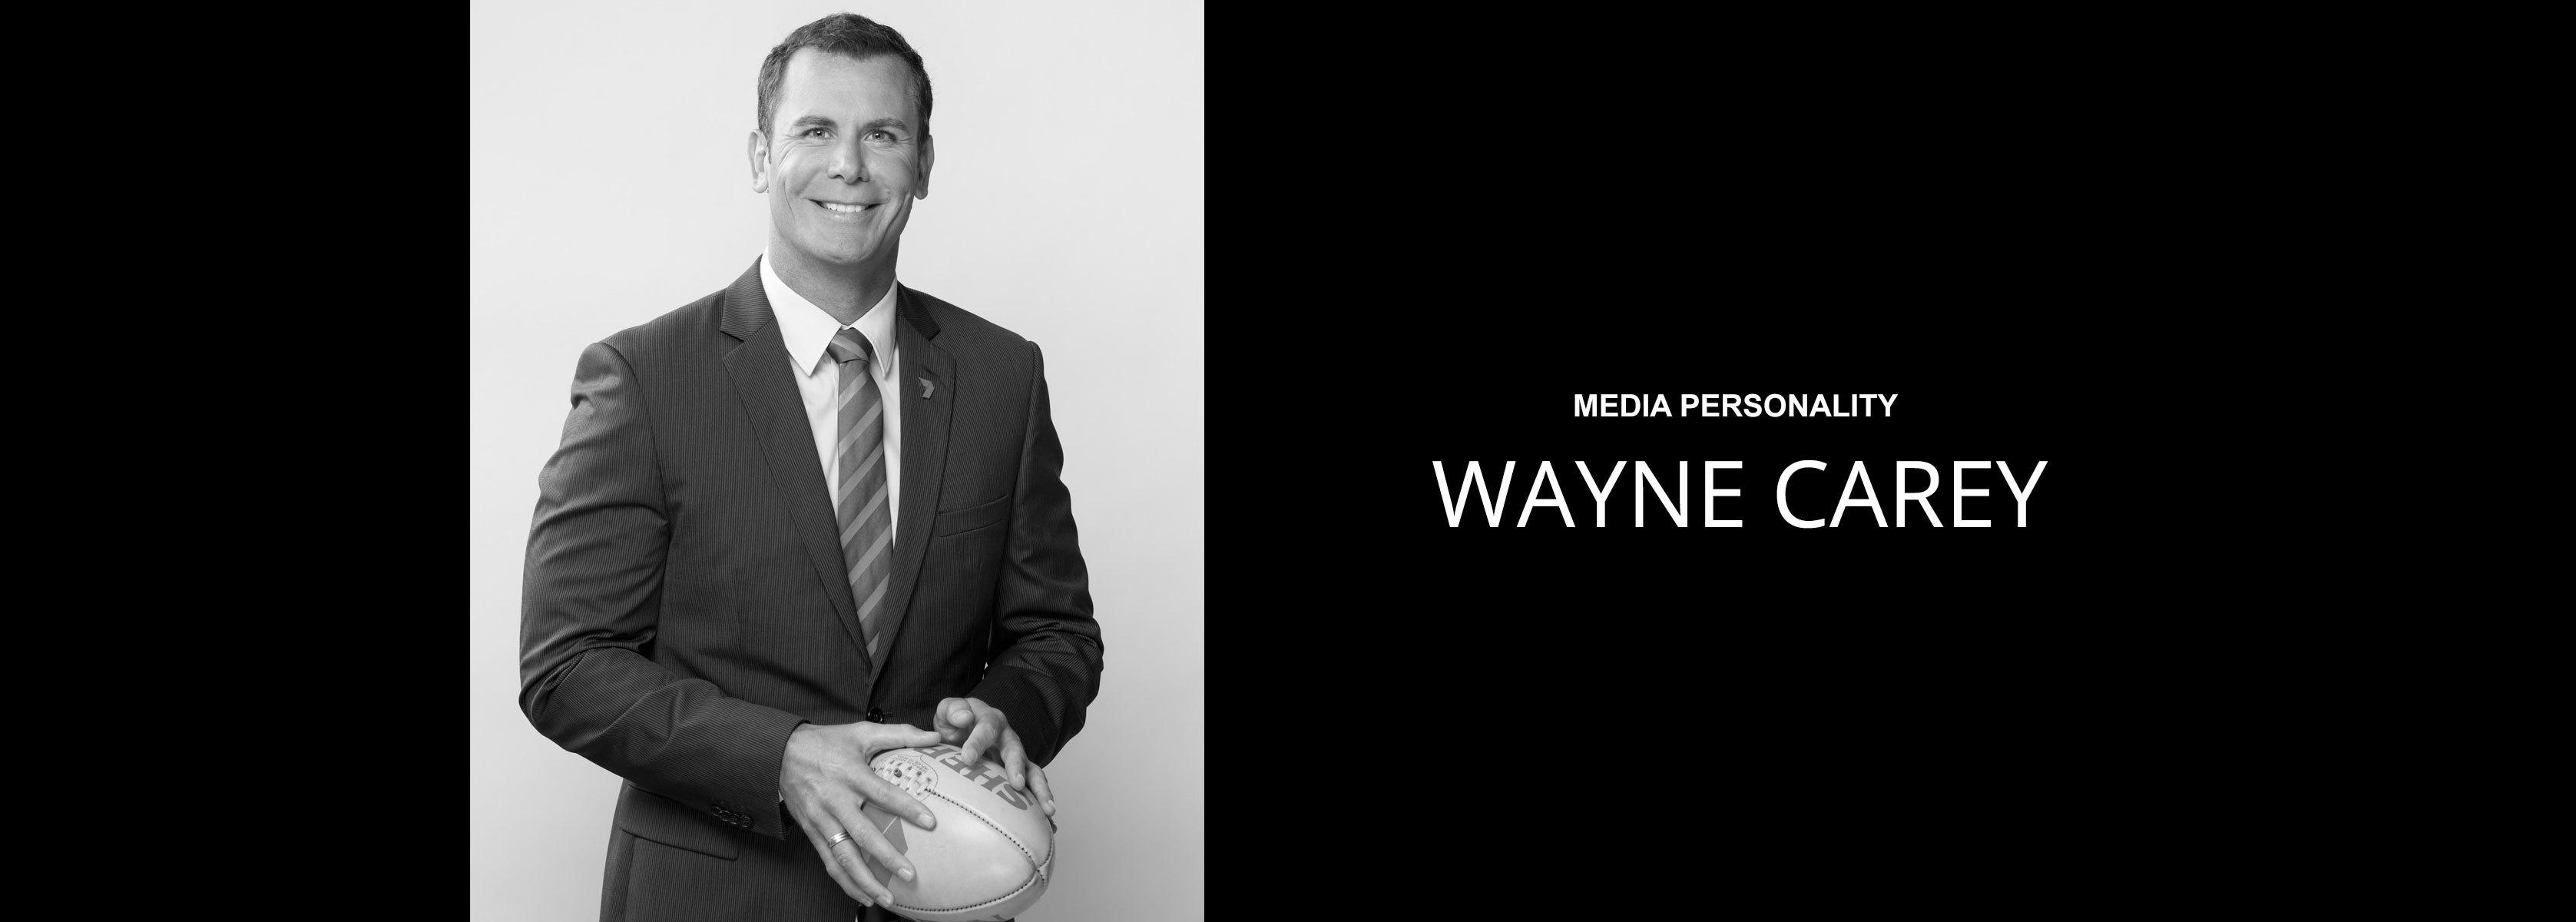 Wayne Carey - Media Personality - Bravo Talent Management